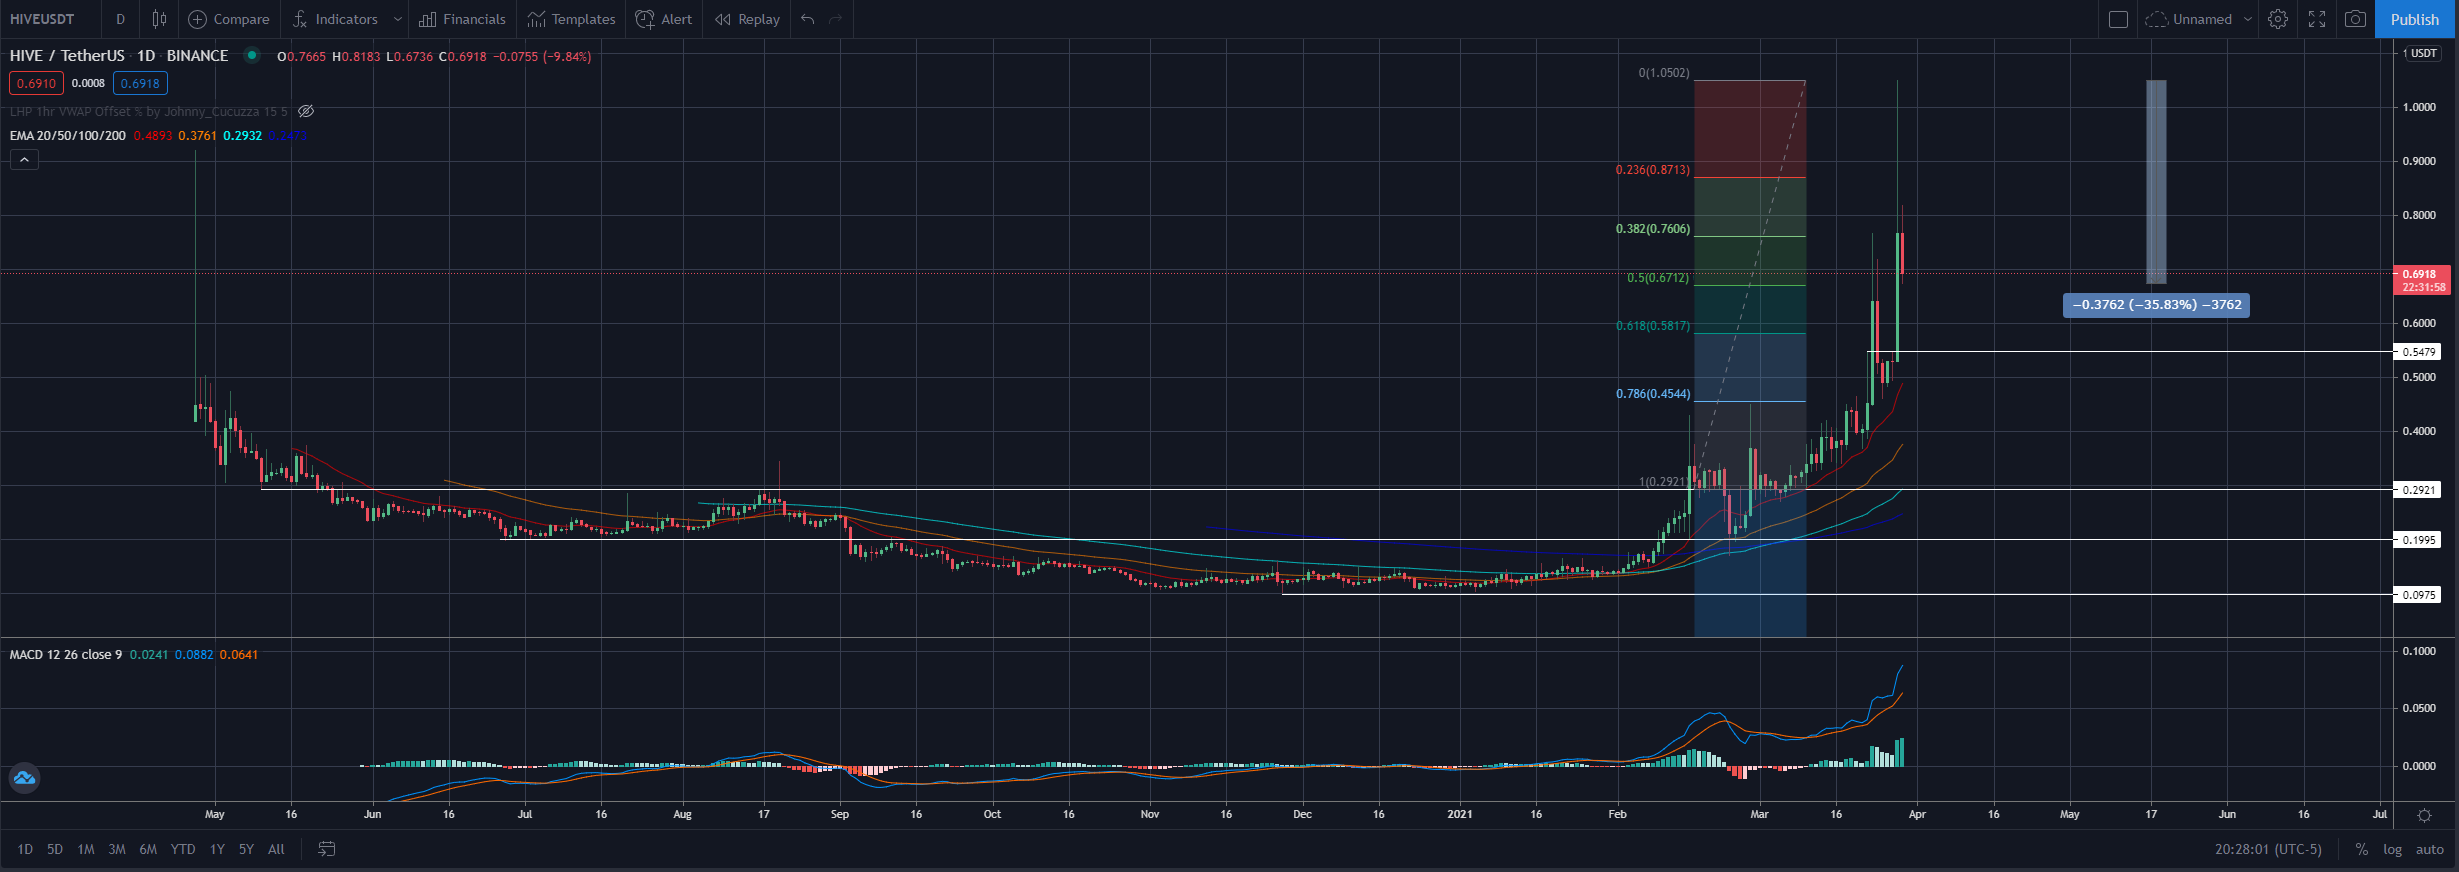 006_big_009_weekend_warrior_trading_banner_big_cryptoxicate_com.png